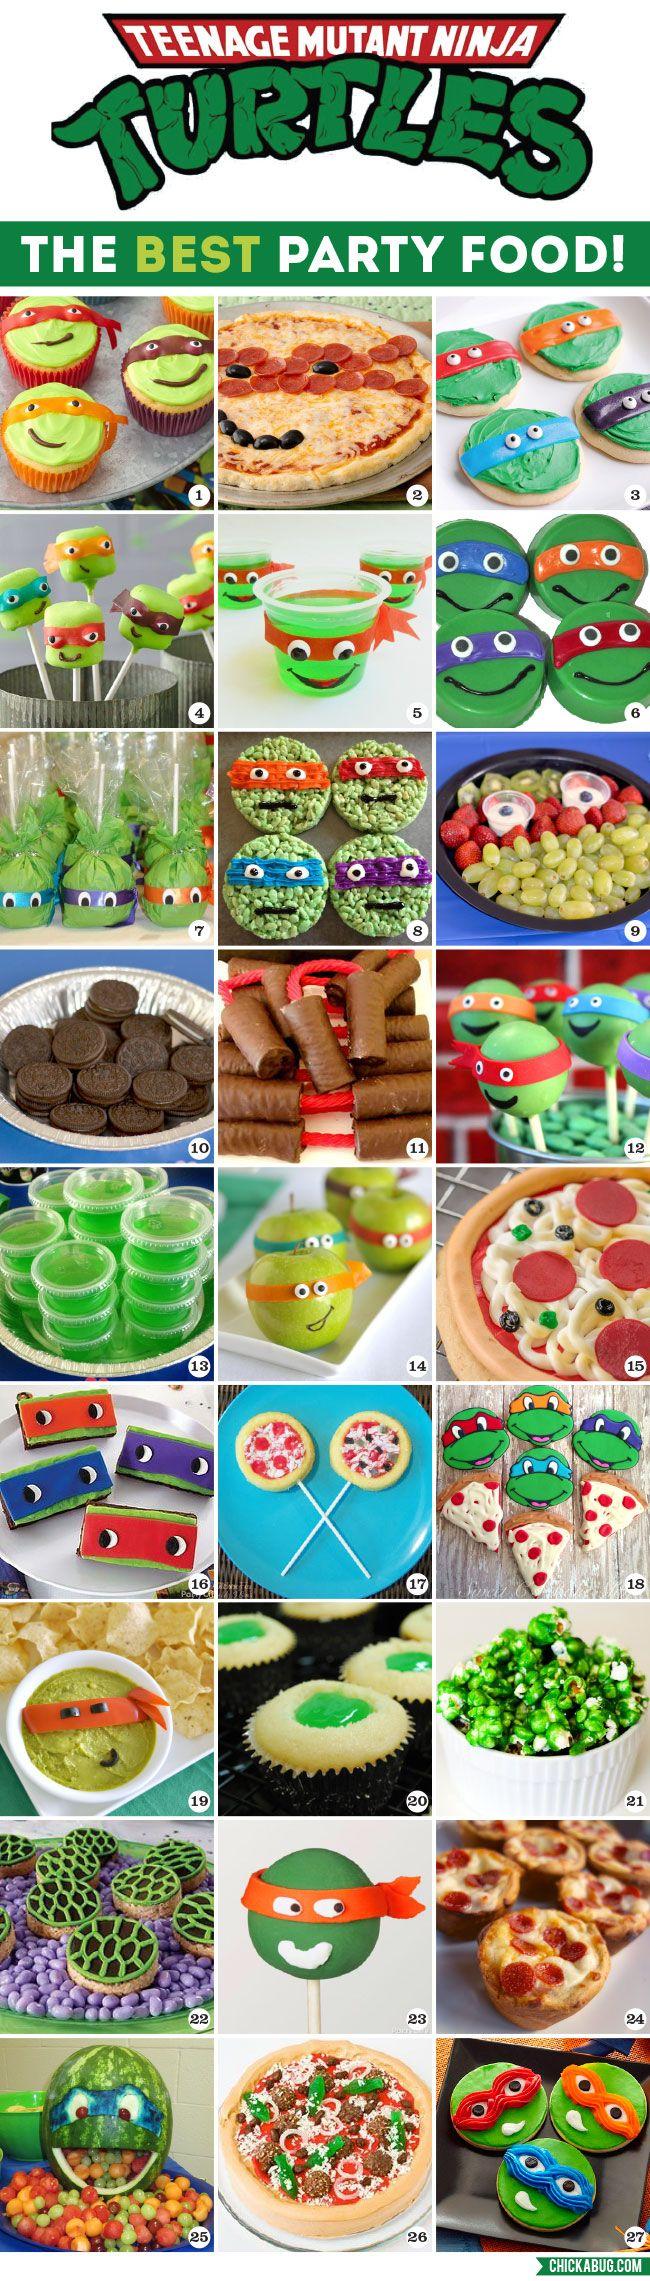 Ideas para un cumpleaños de los Teenage Mutant Ninja Turtles (Las Tortugas Ninja).